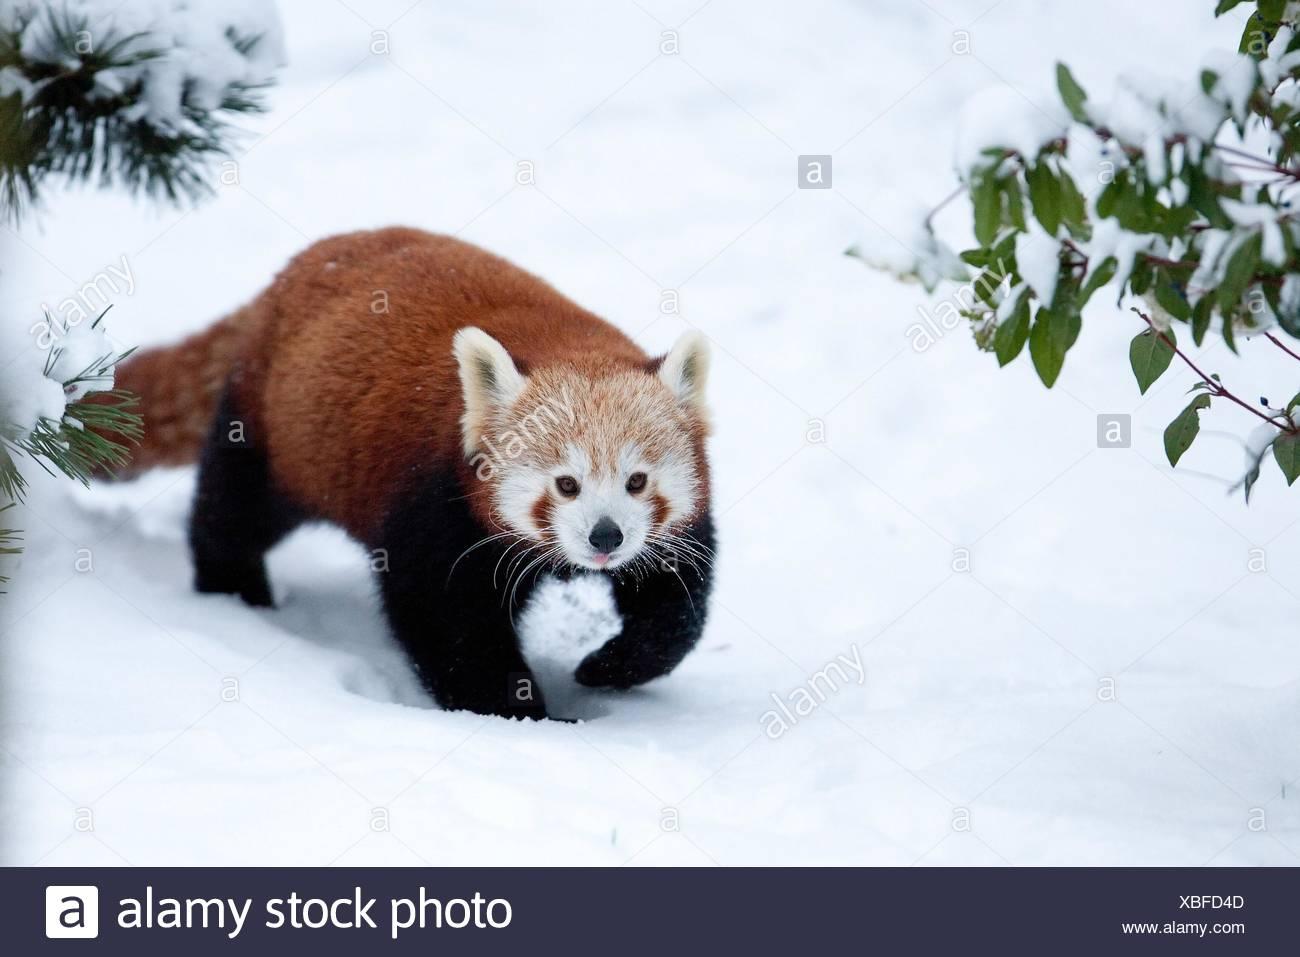 lesser panda Stock Photo